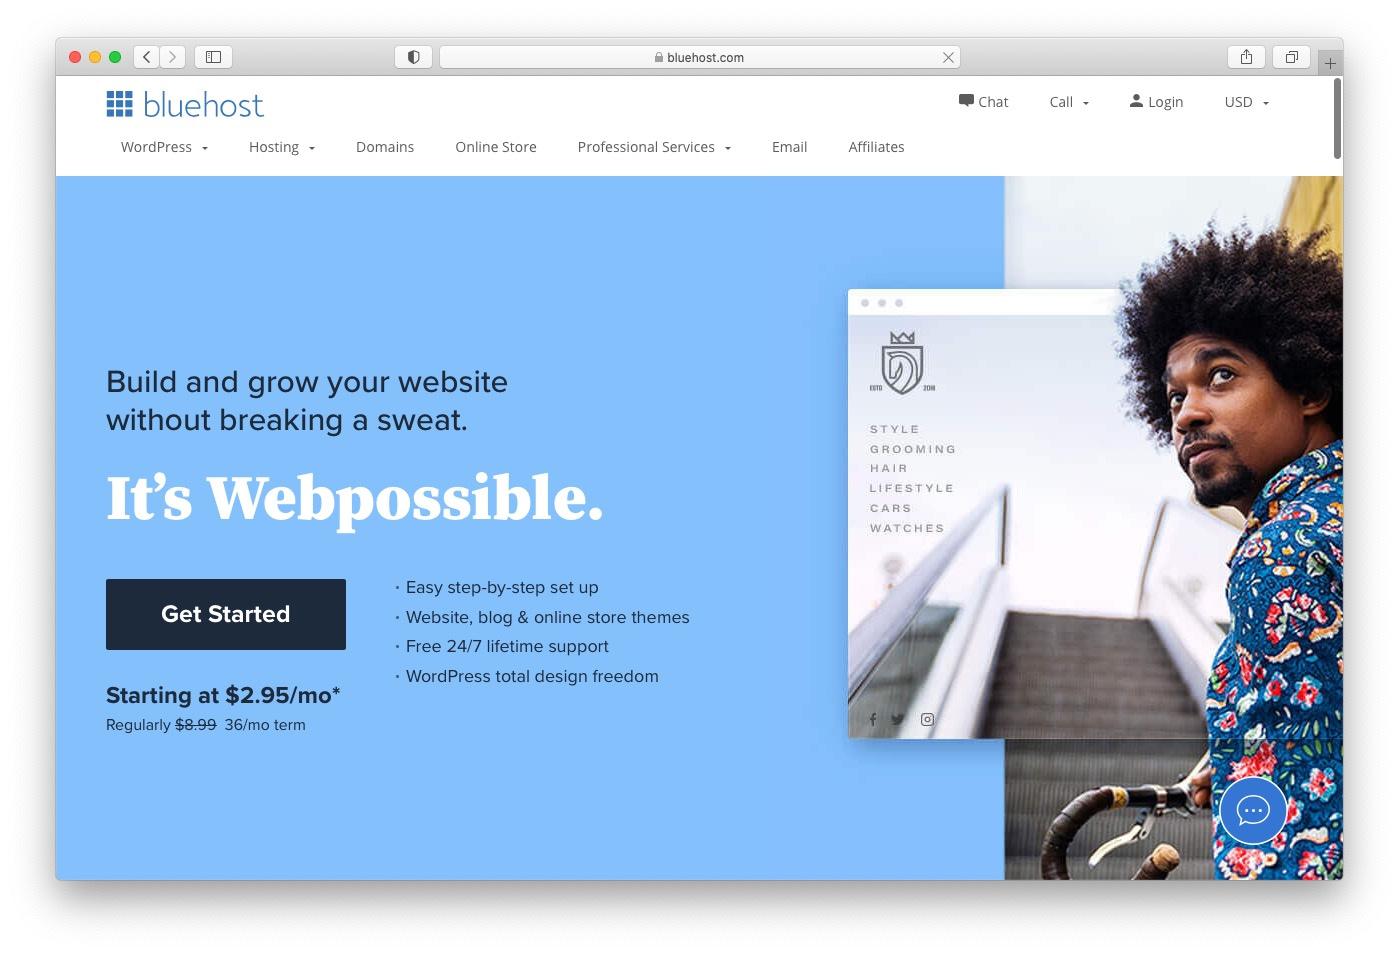 Best web hosting services: Bluehost